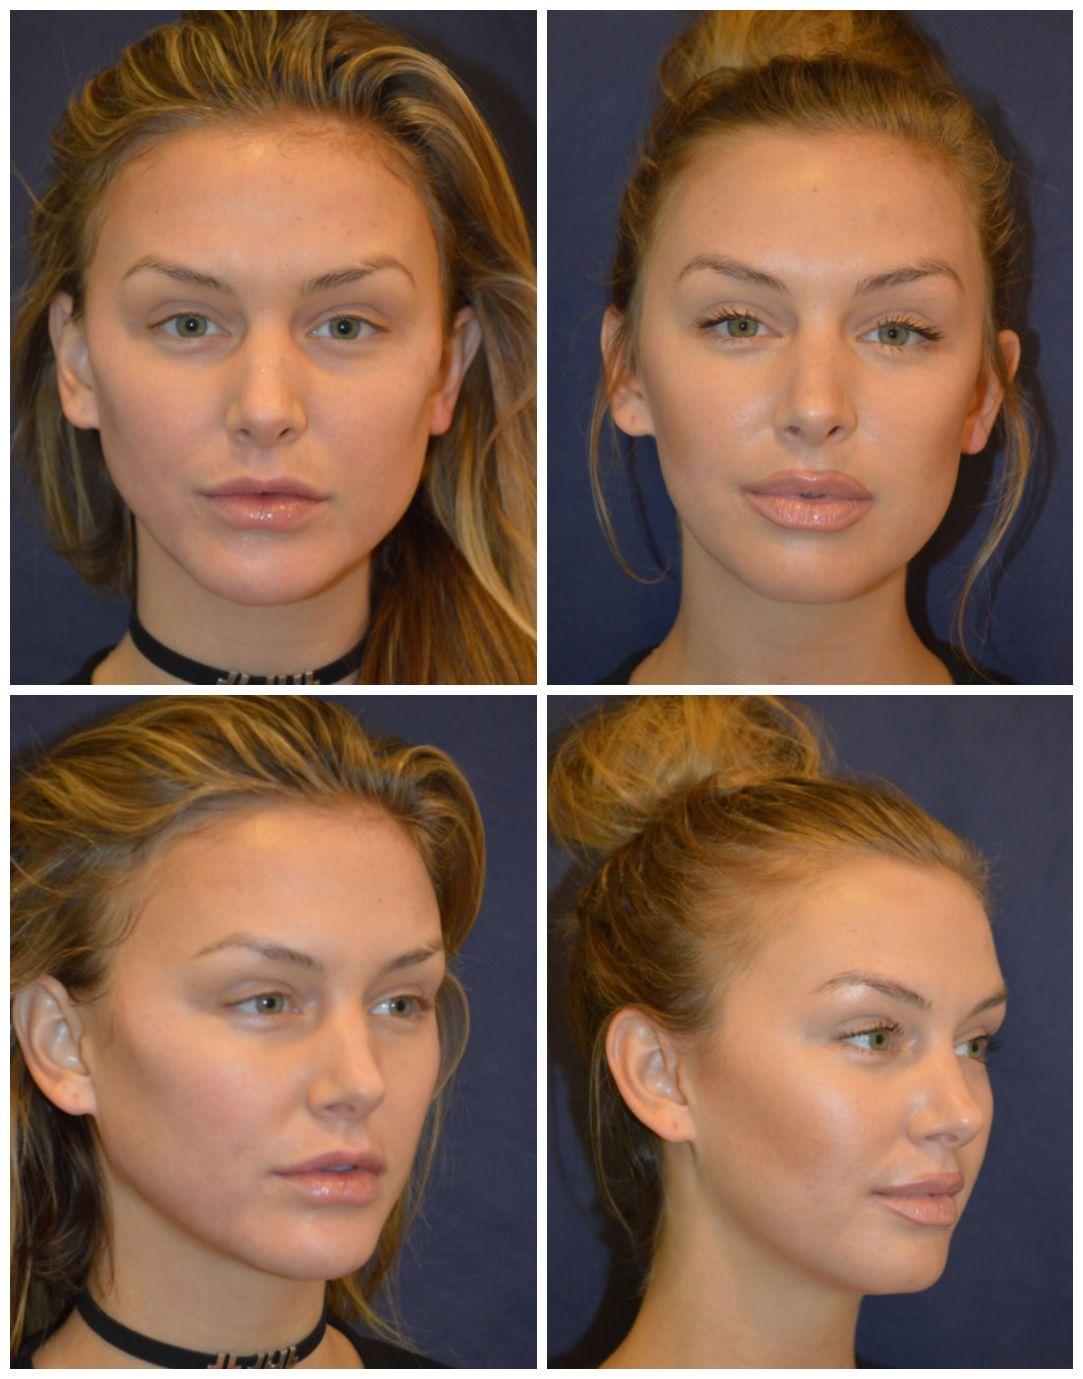 Vanderpump Rules Lala Kent Tells All On Recent Cosmetic